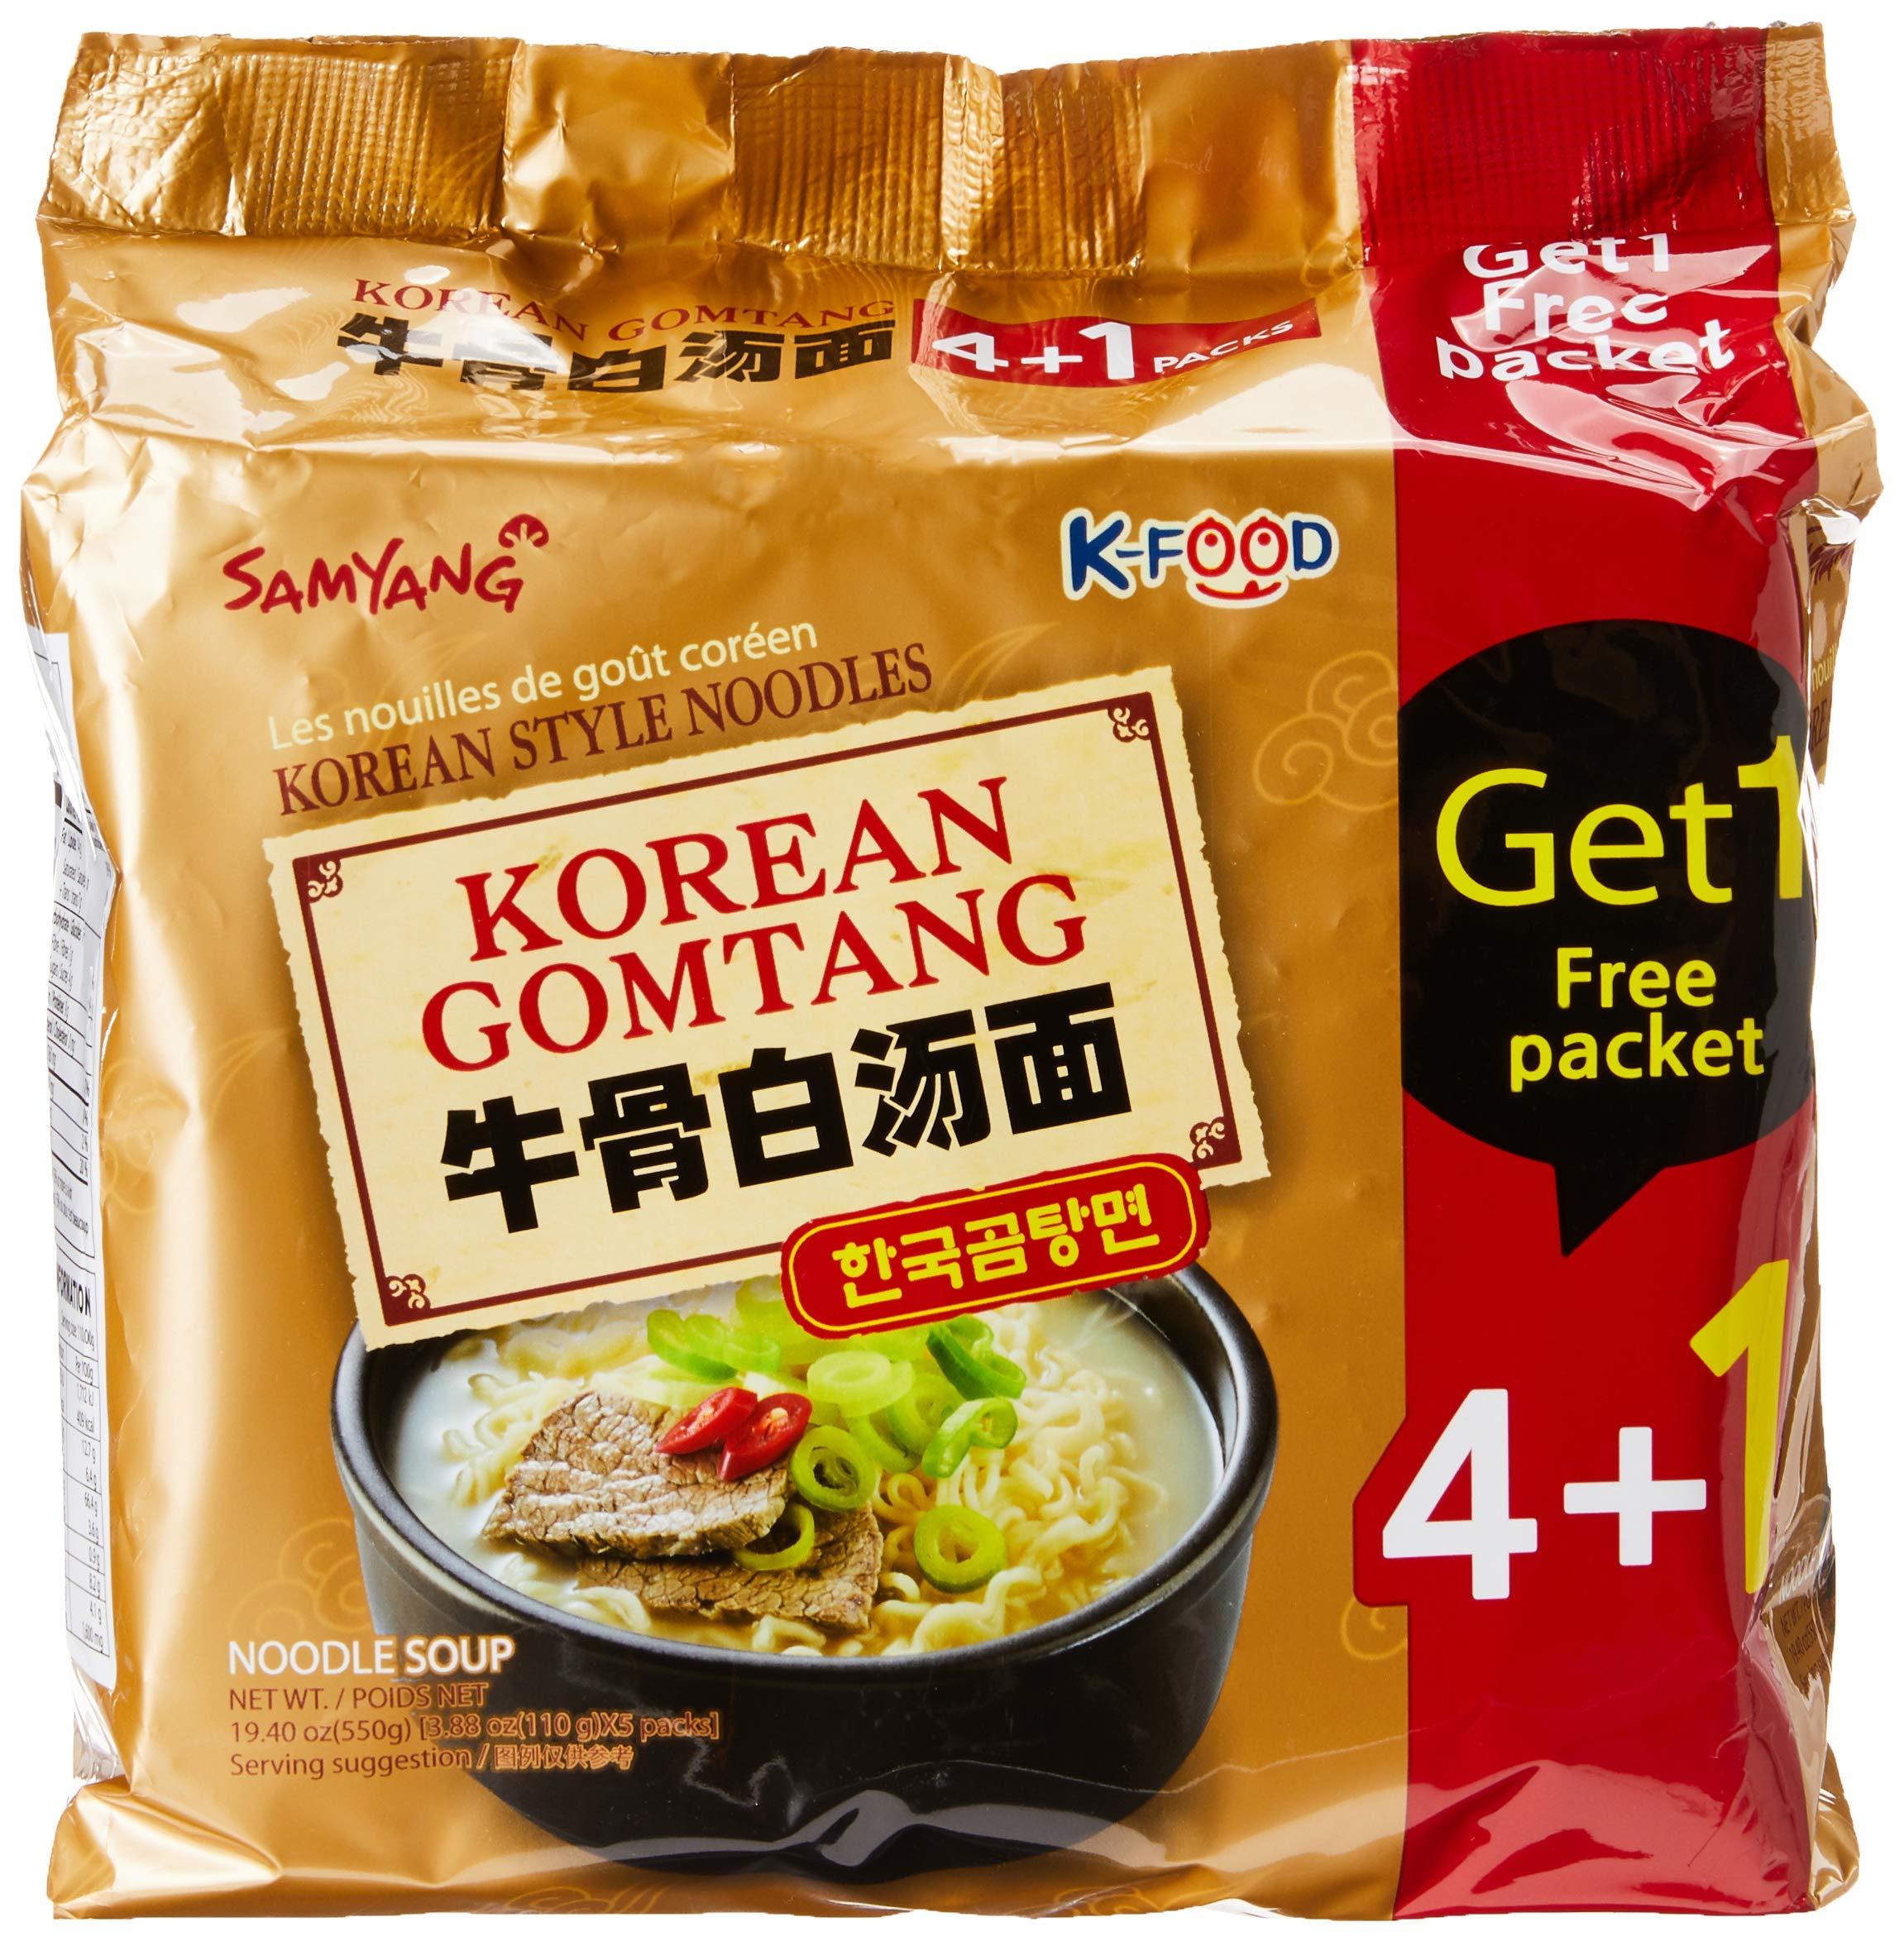 NEW! Samyang Korea Gomtang Ramen Ramyeon Noodle Soup (Pack of 5)